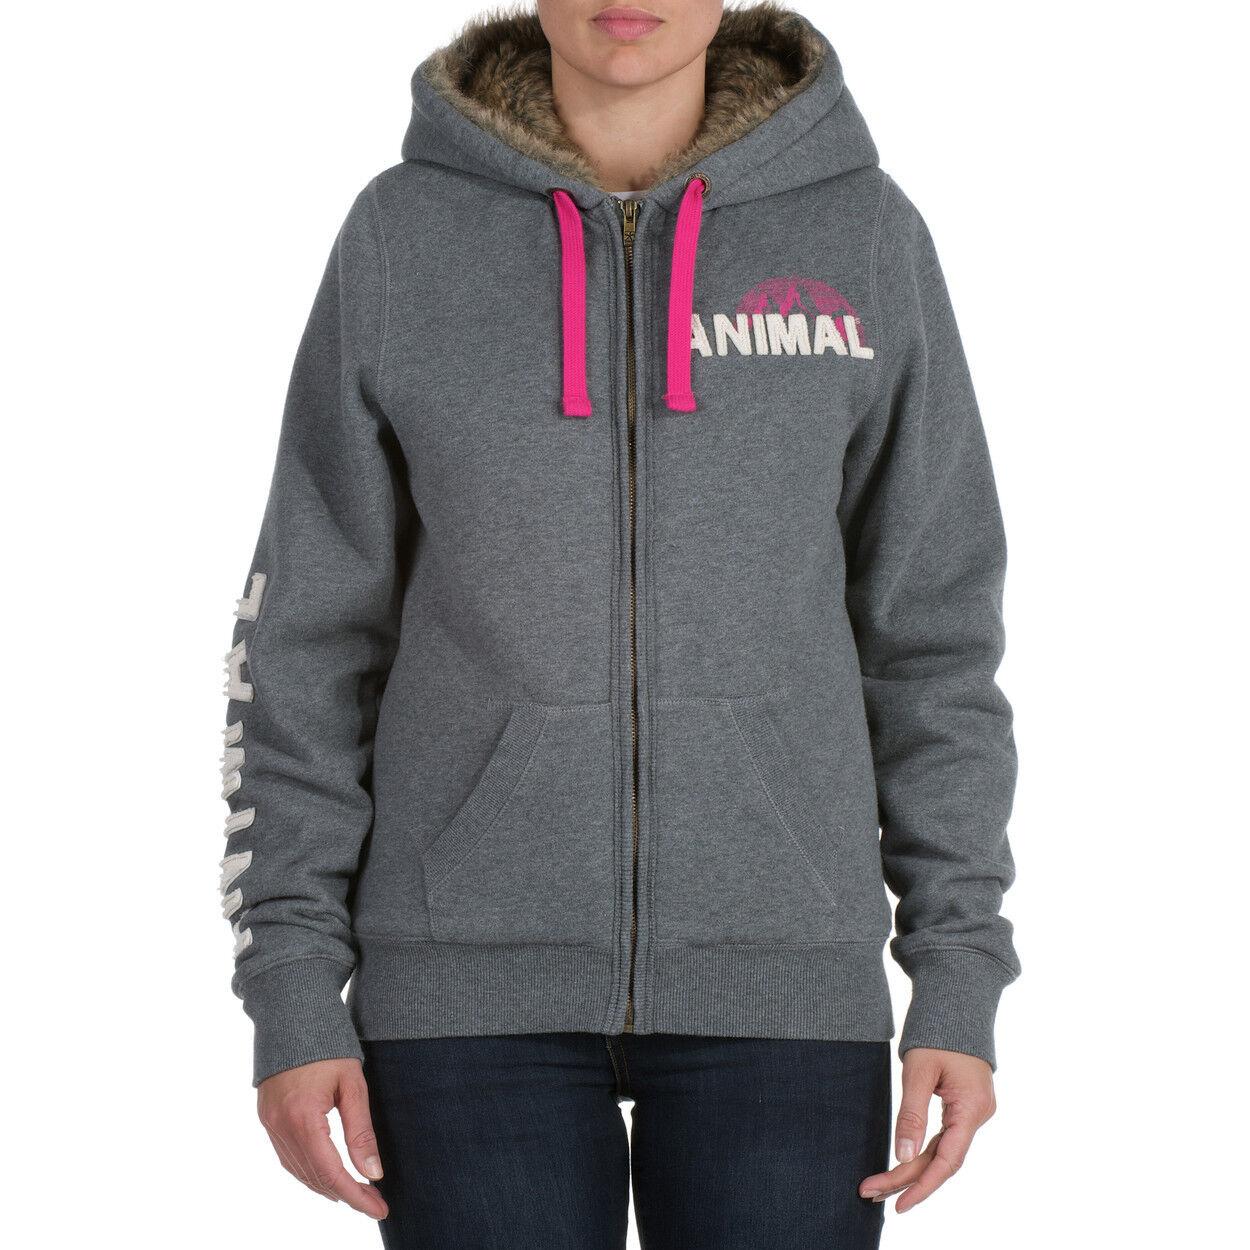 Animal Jaklyn Full Zip Hoody Charcoal CL3WC379 J41 NEW NEW NEW f1e7b9